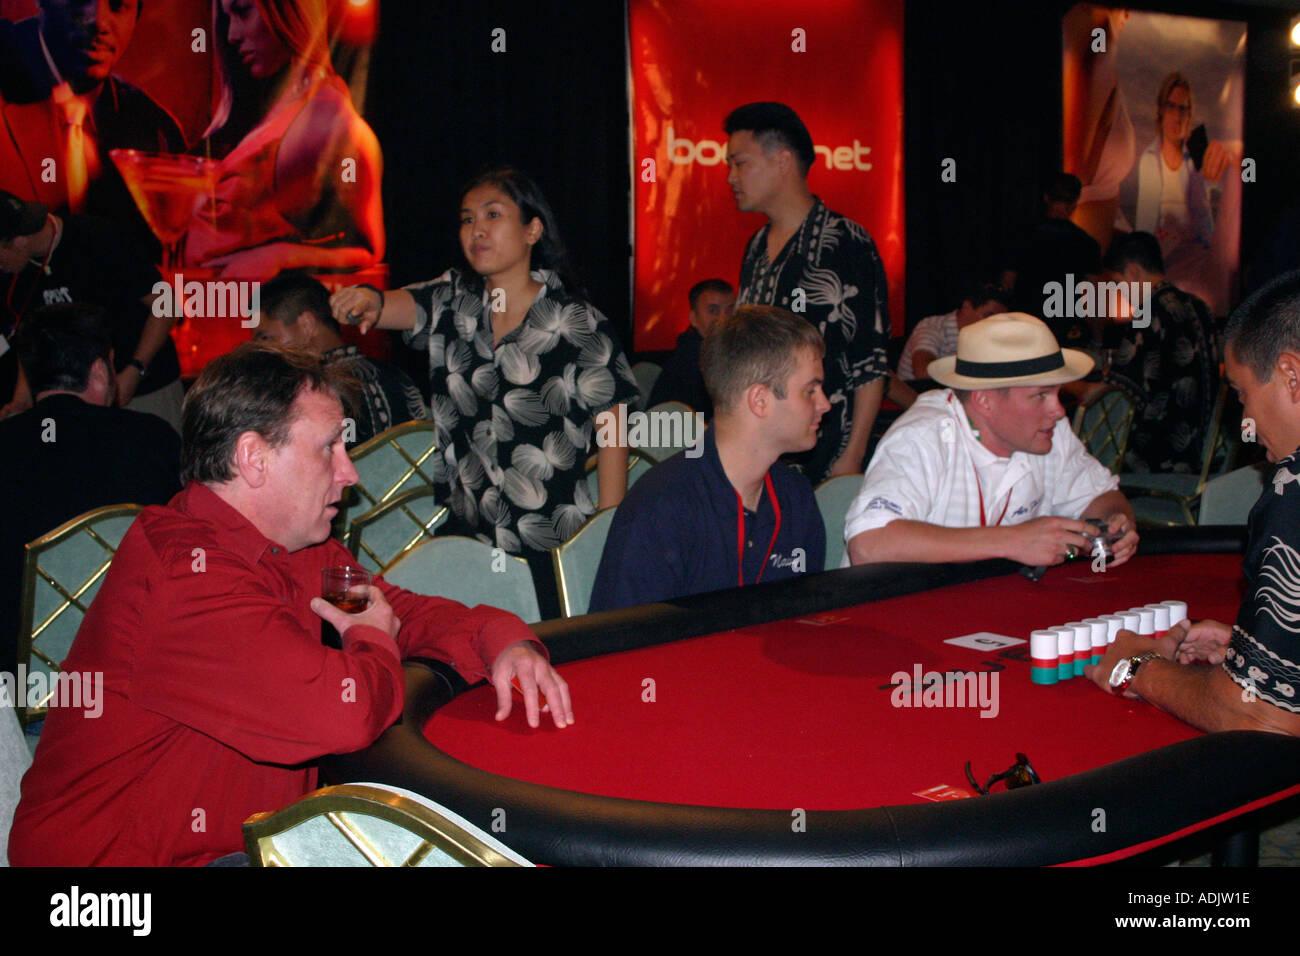 Winning hands in texas holdem poker